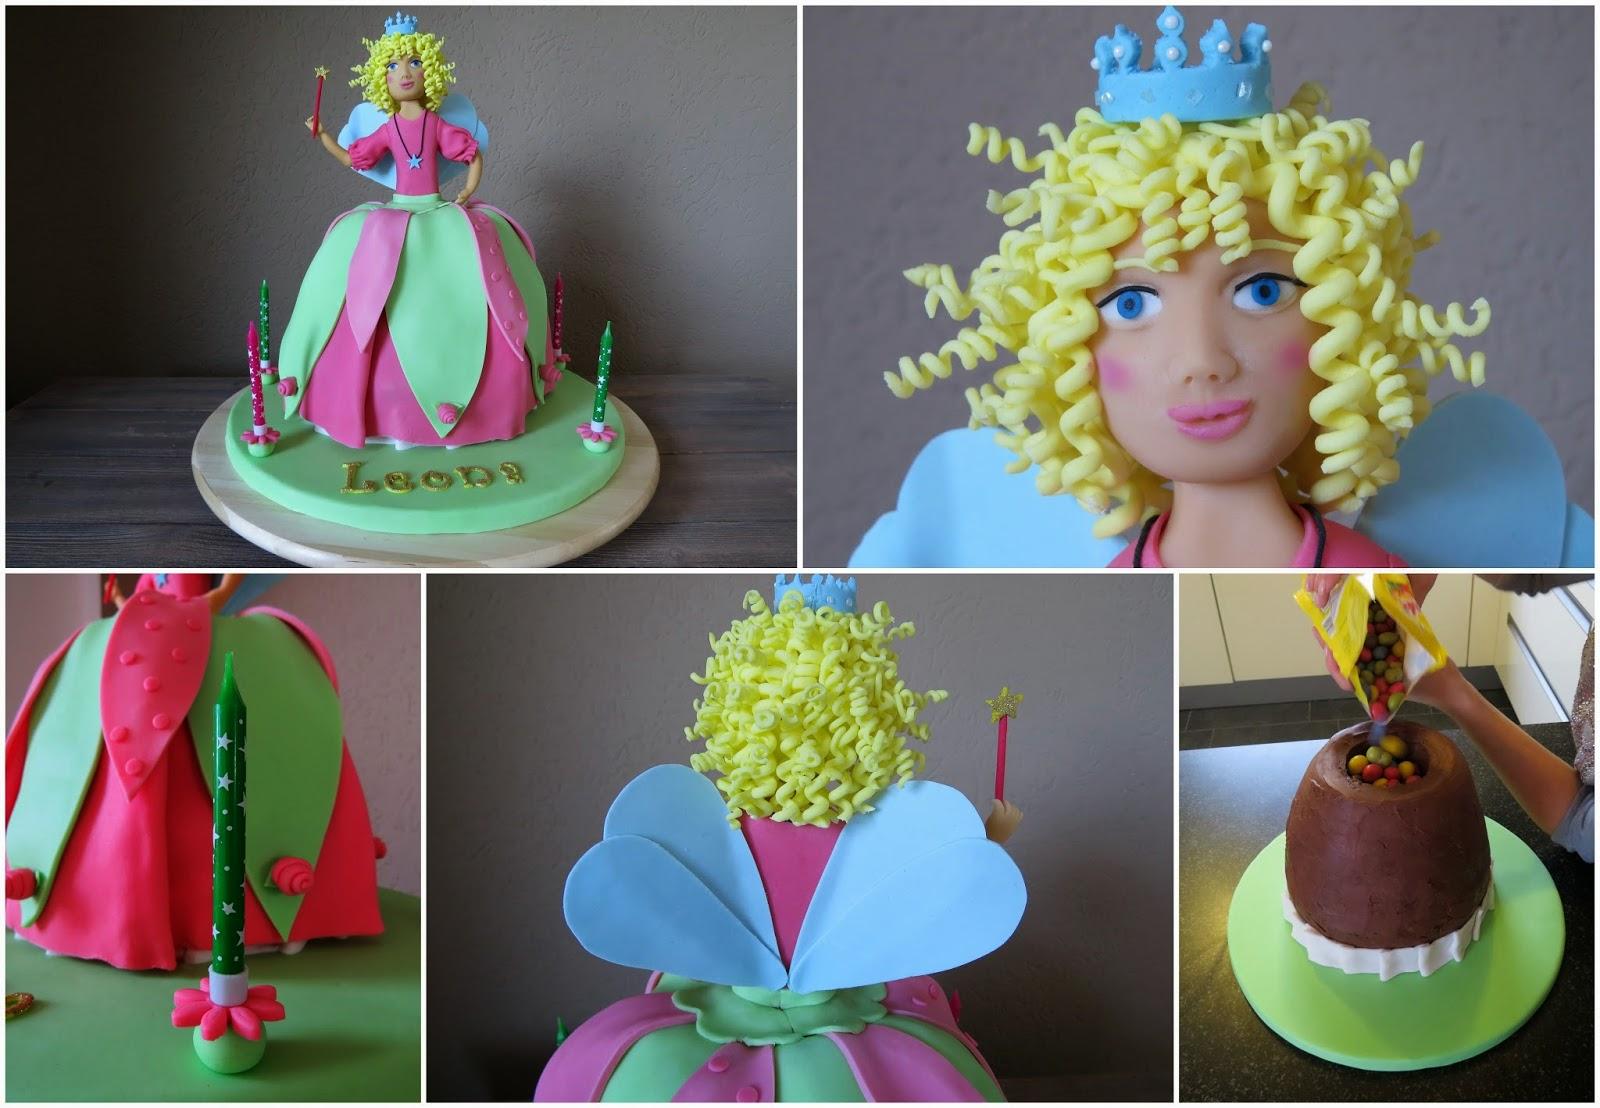 Lillifee Torte